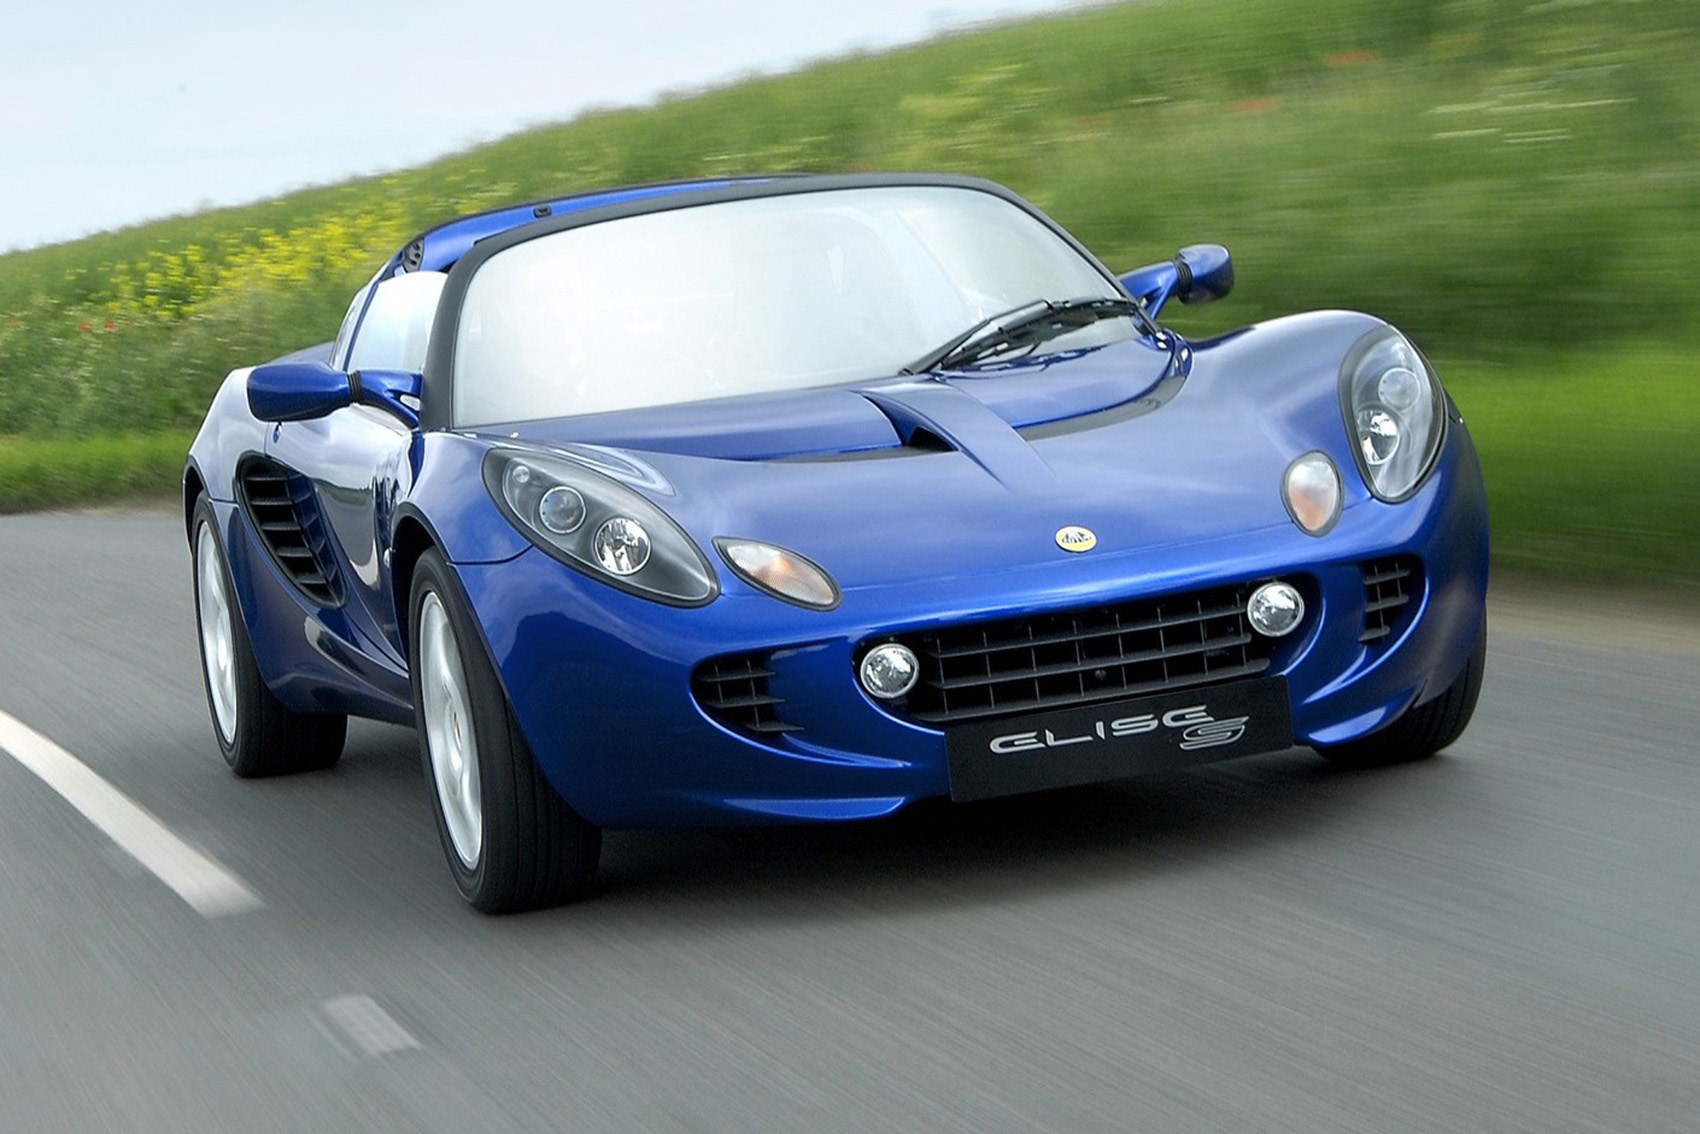 Lotus Elise - fast economical cars